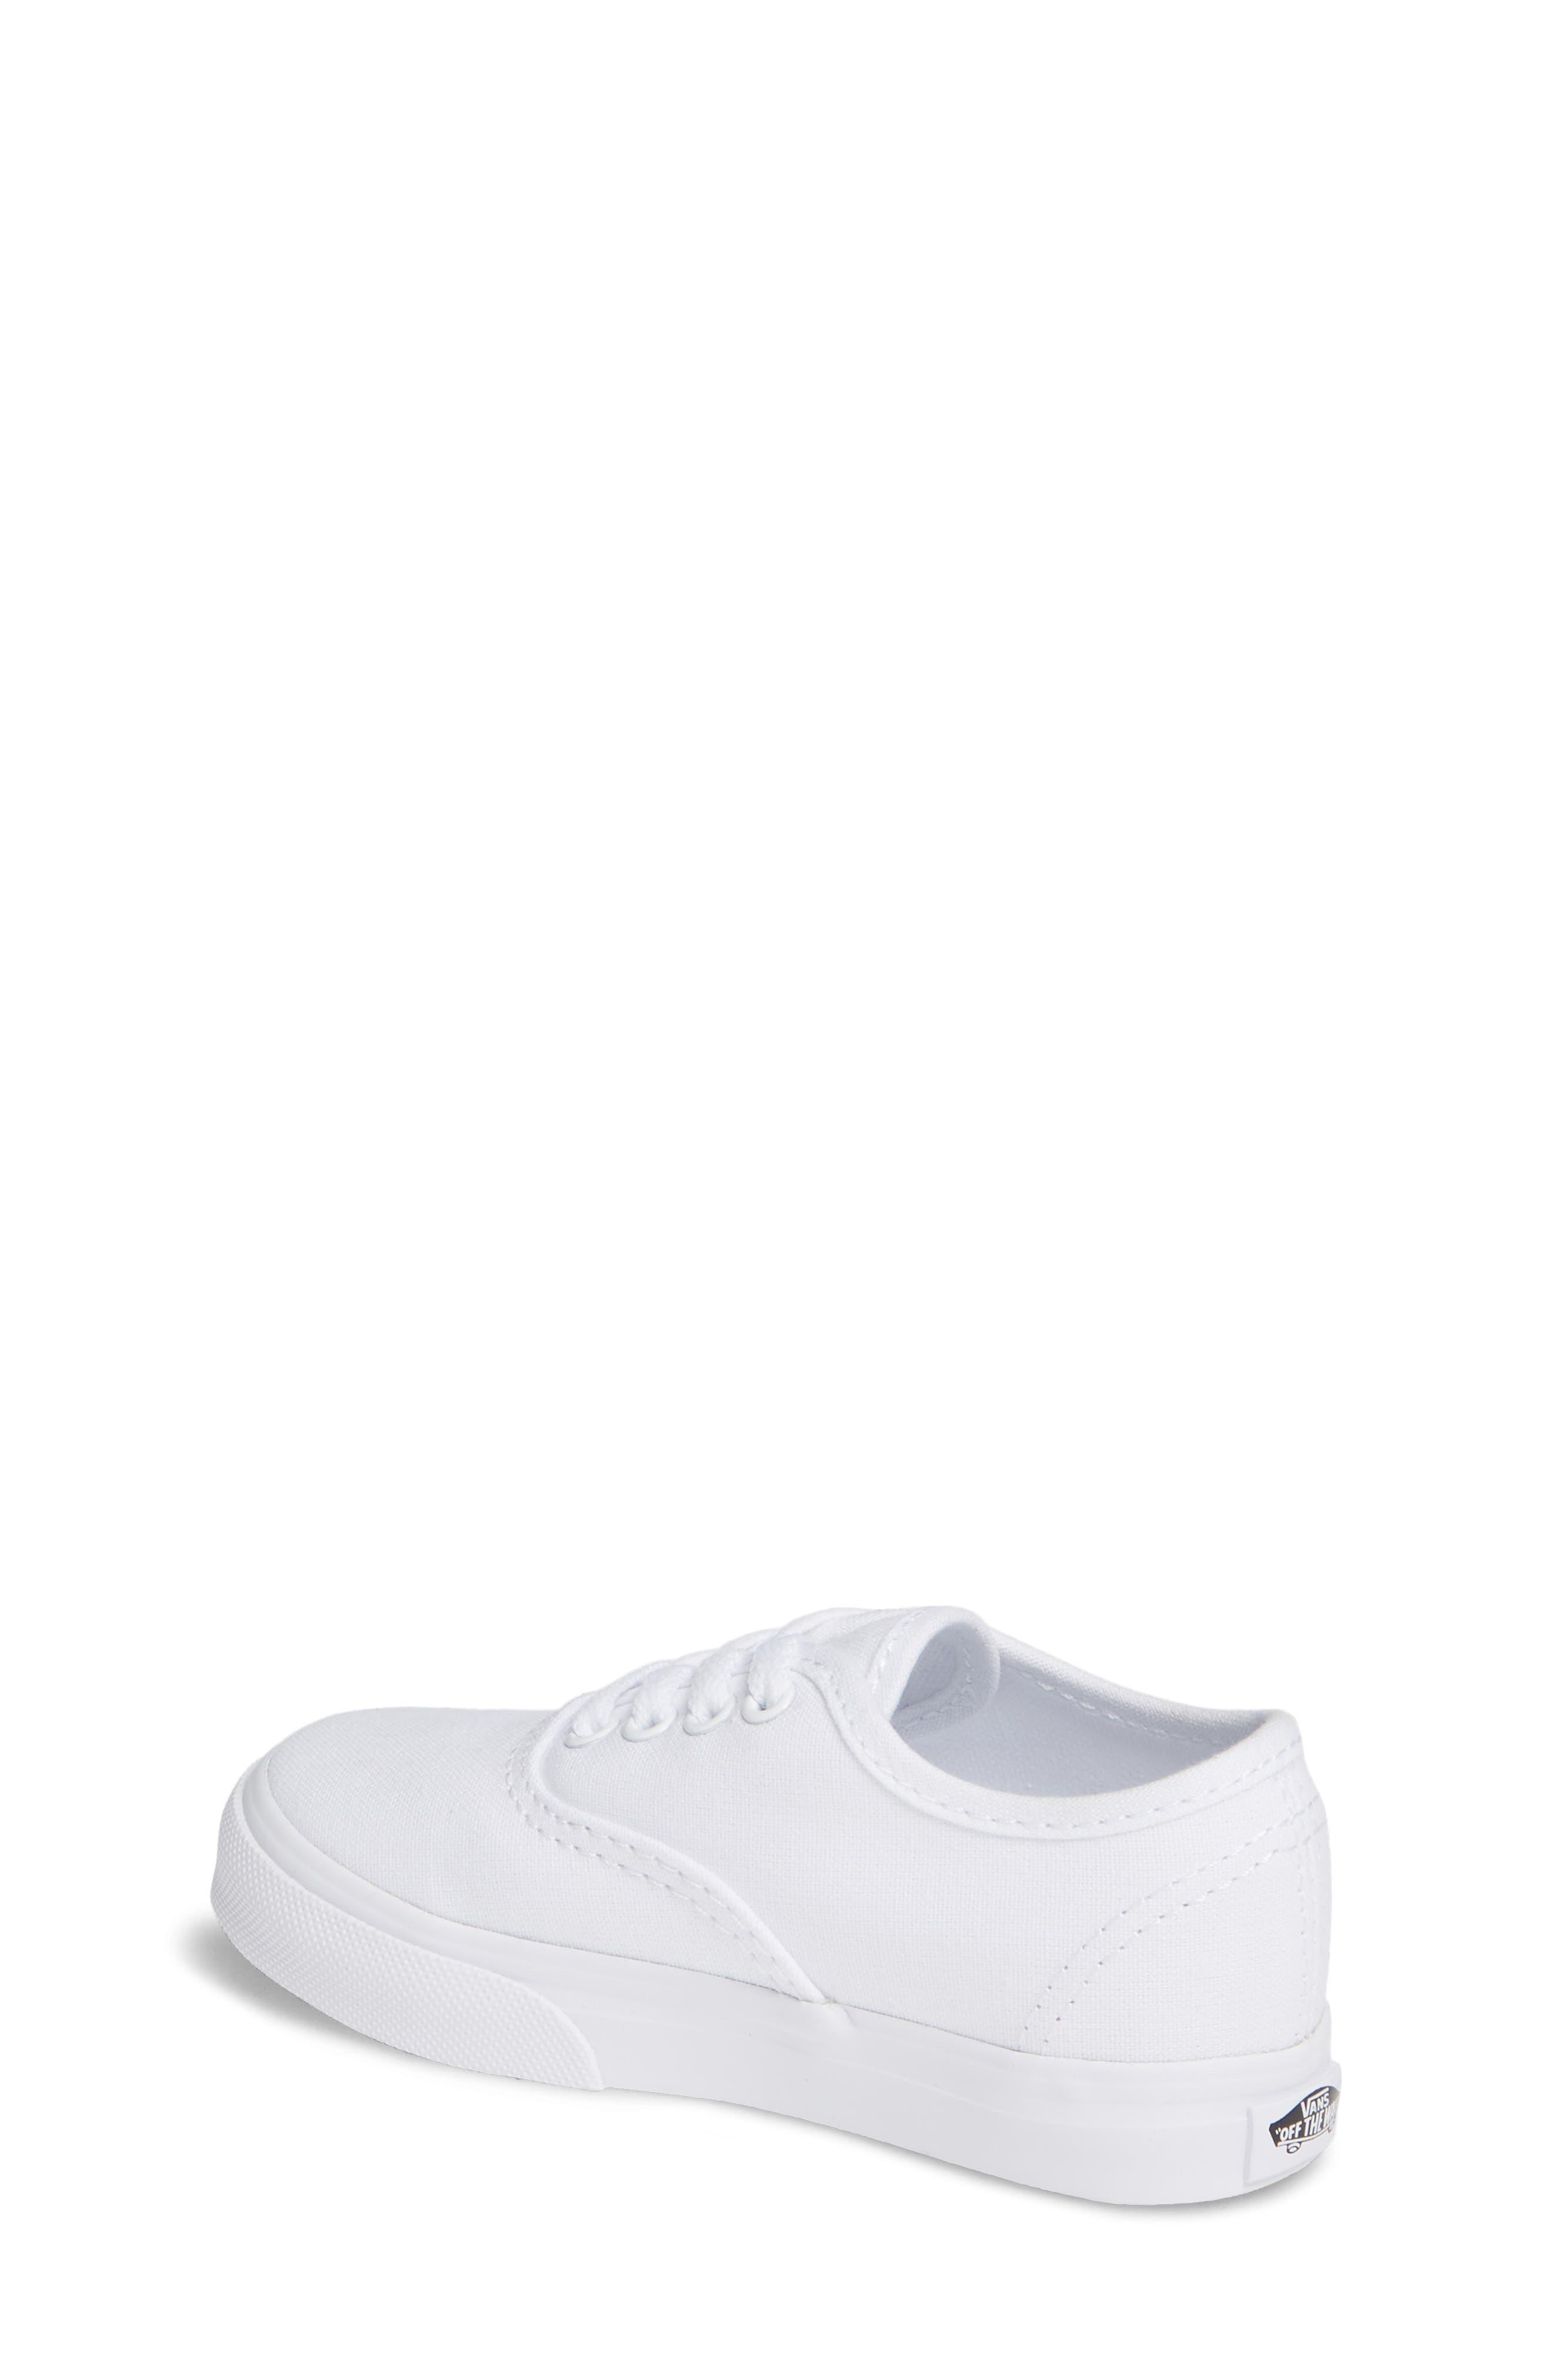 VANS, 'Authentic' Sneaker, Alternate thumbnail 2, color, TRUE WHITE/ WHITE